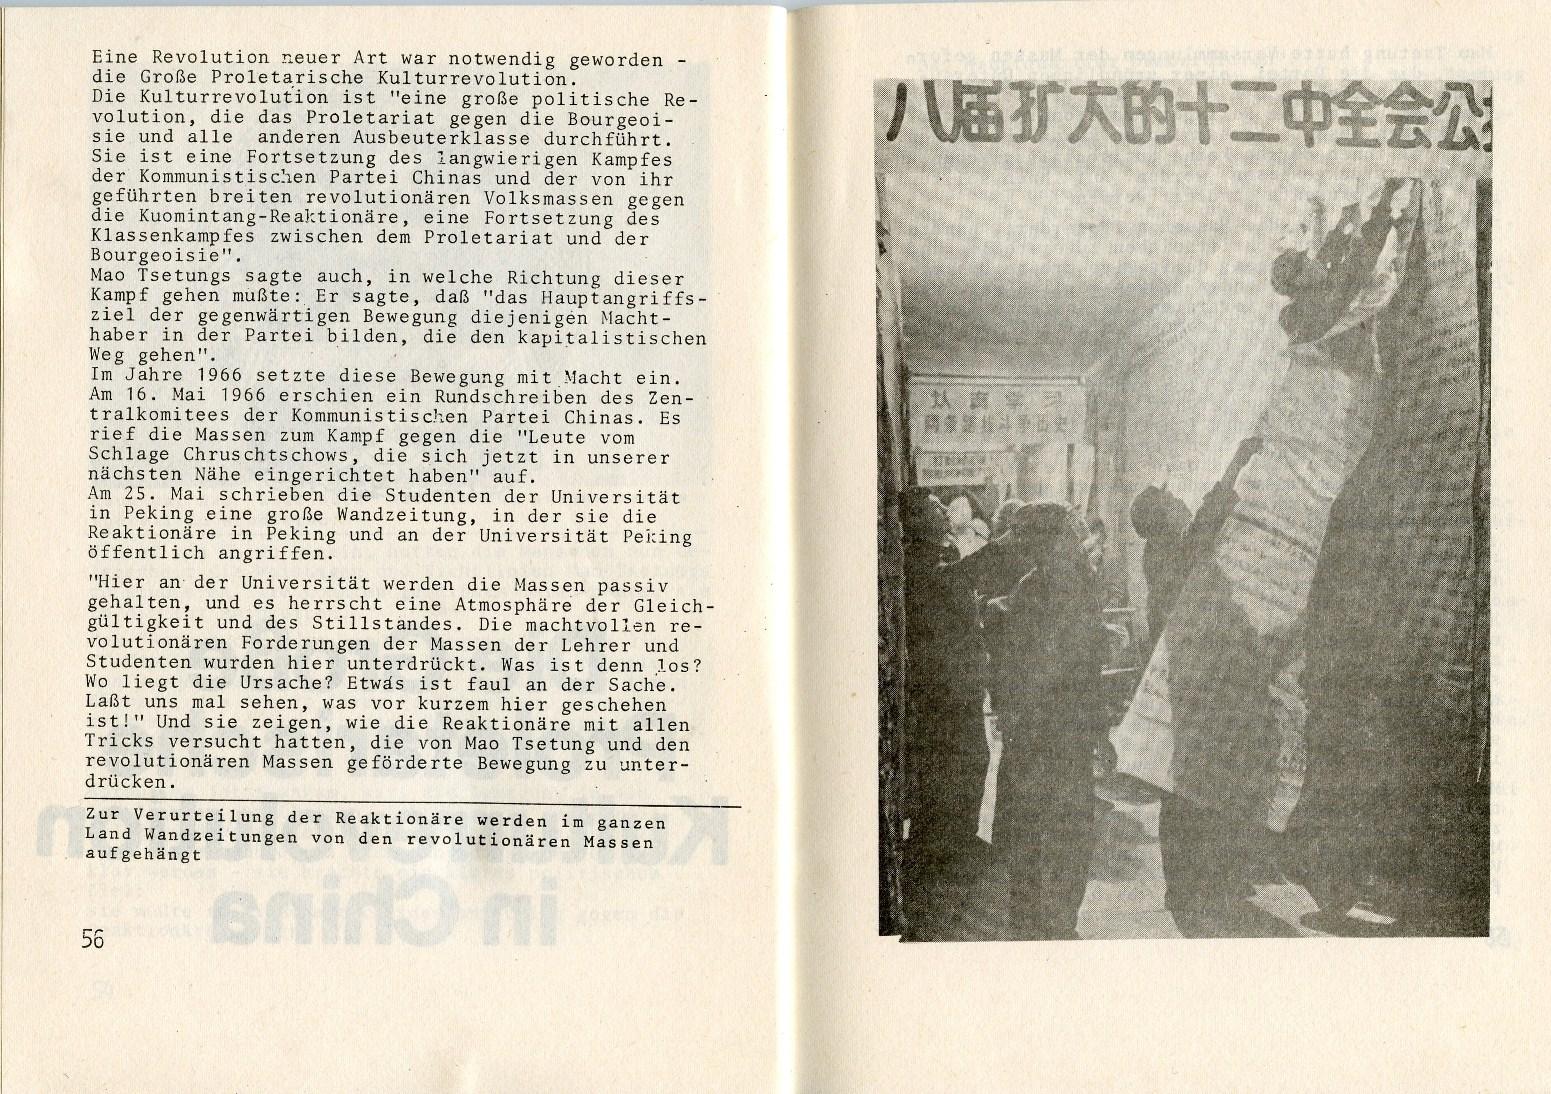 ZB_KPChinas_1971_30